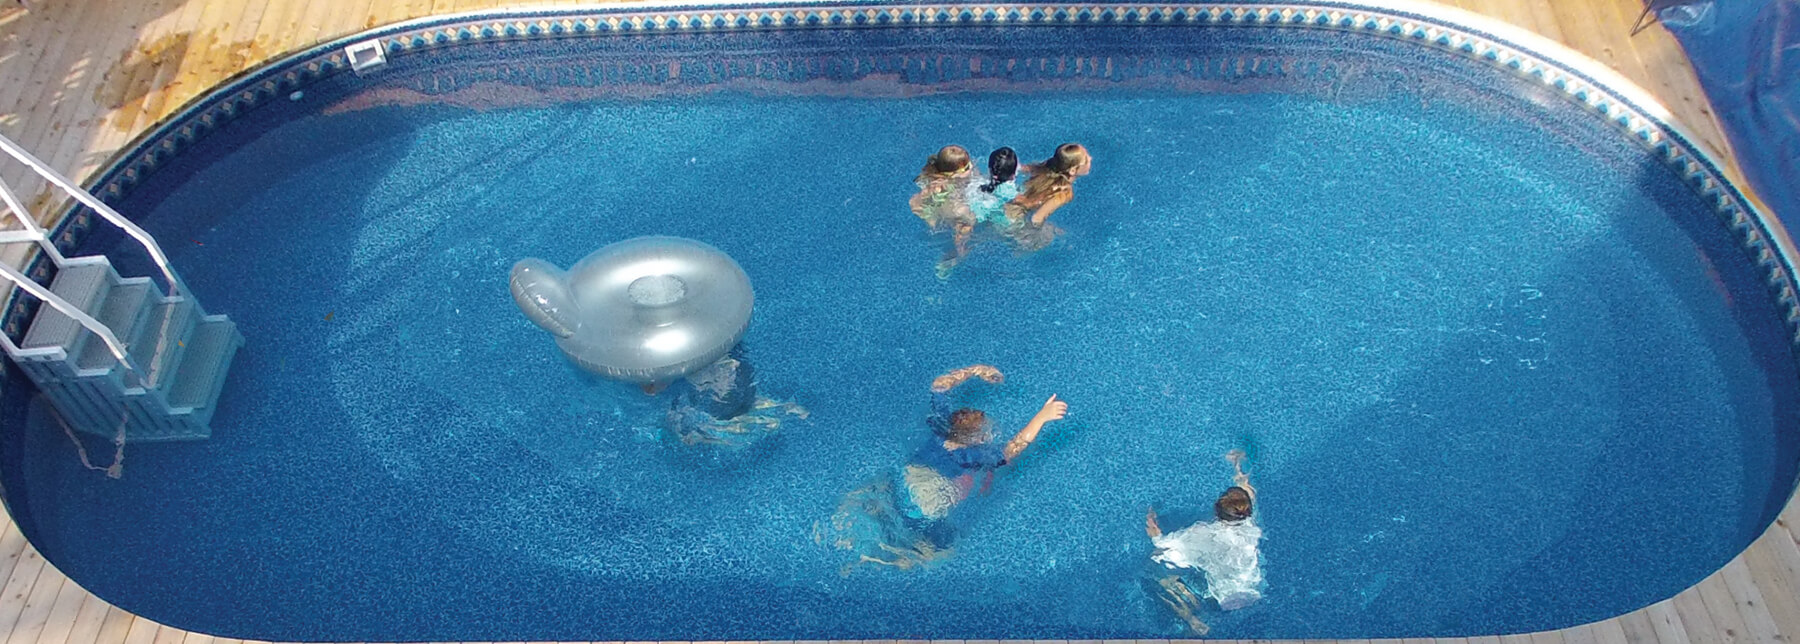 Swimming Pools Hot Tubs Swim Spas Pool King